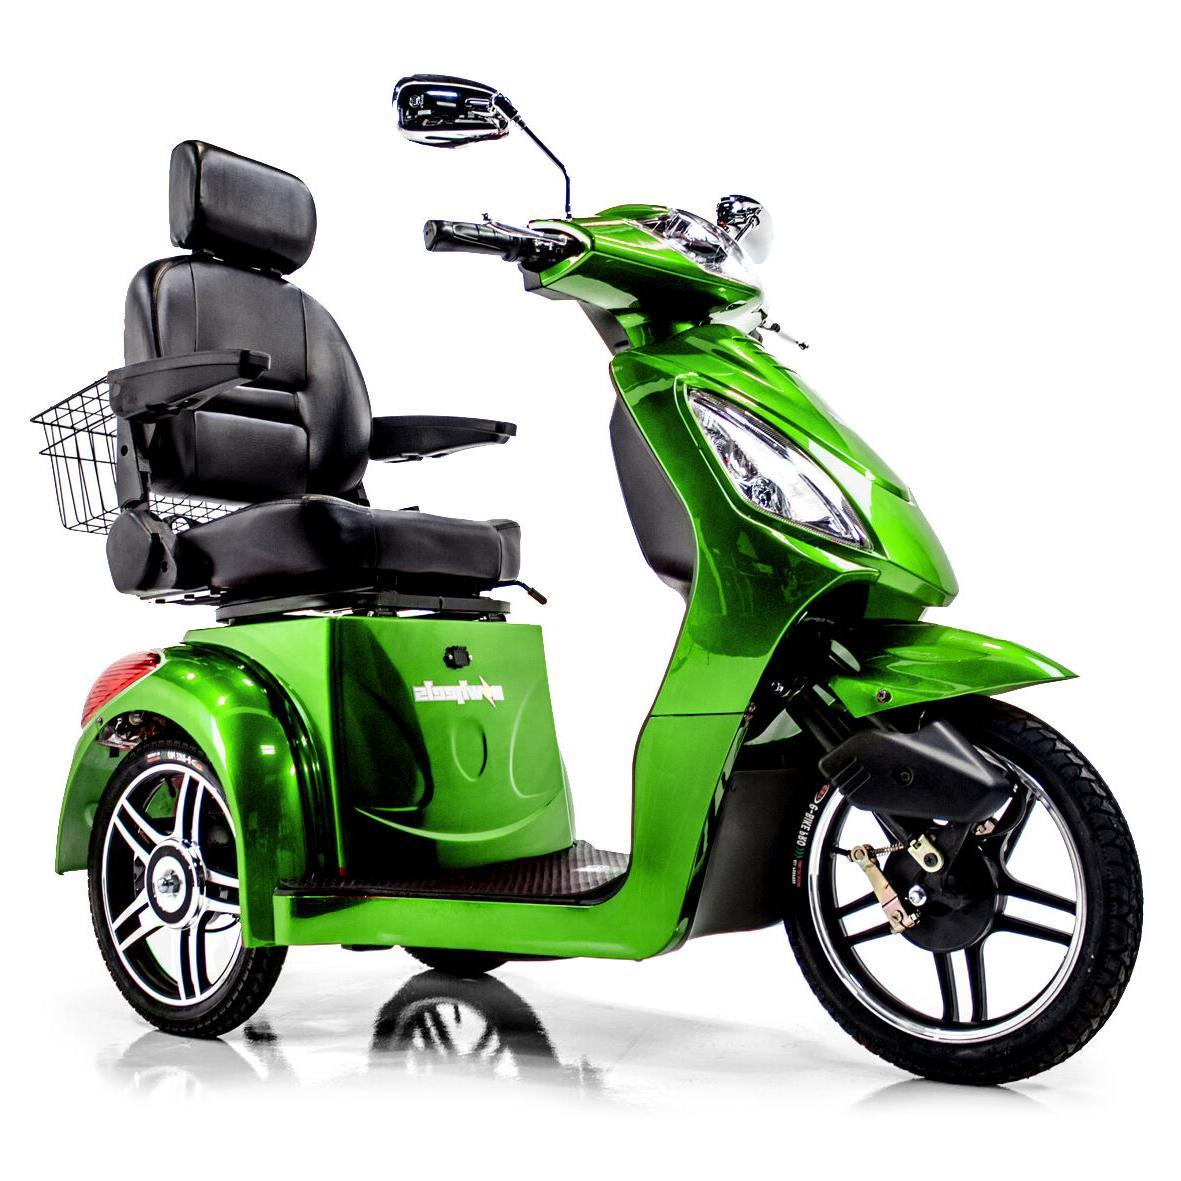 E-Wheels Mobility Scooter EW36 + Free Accessory Bundle!